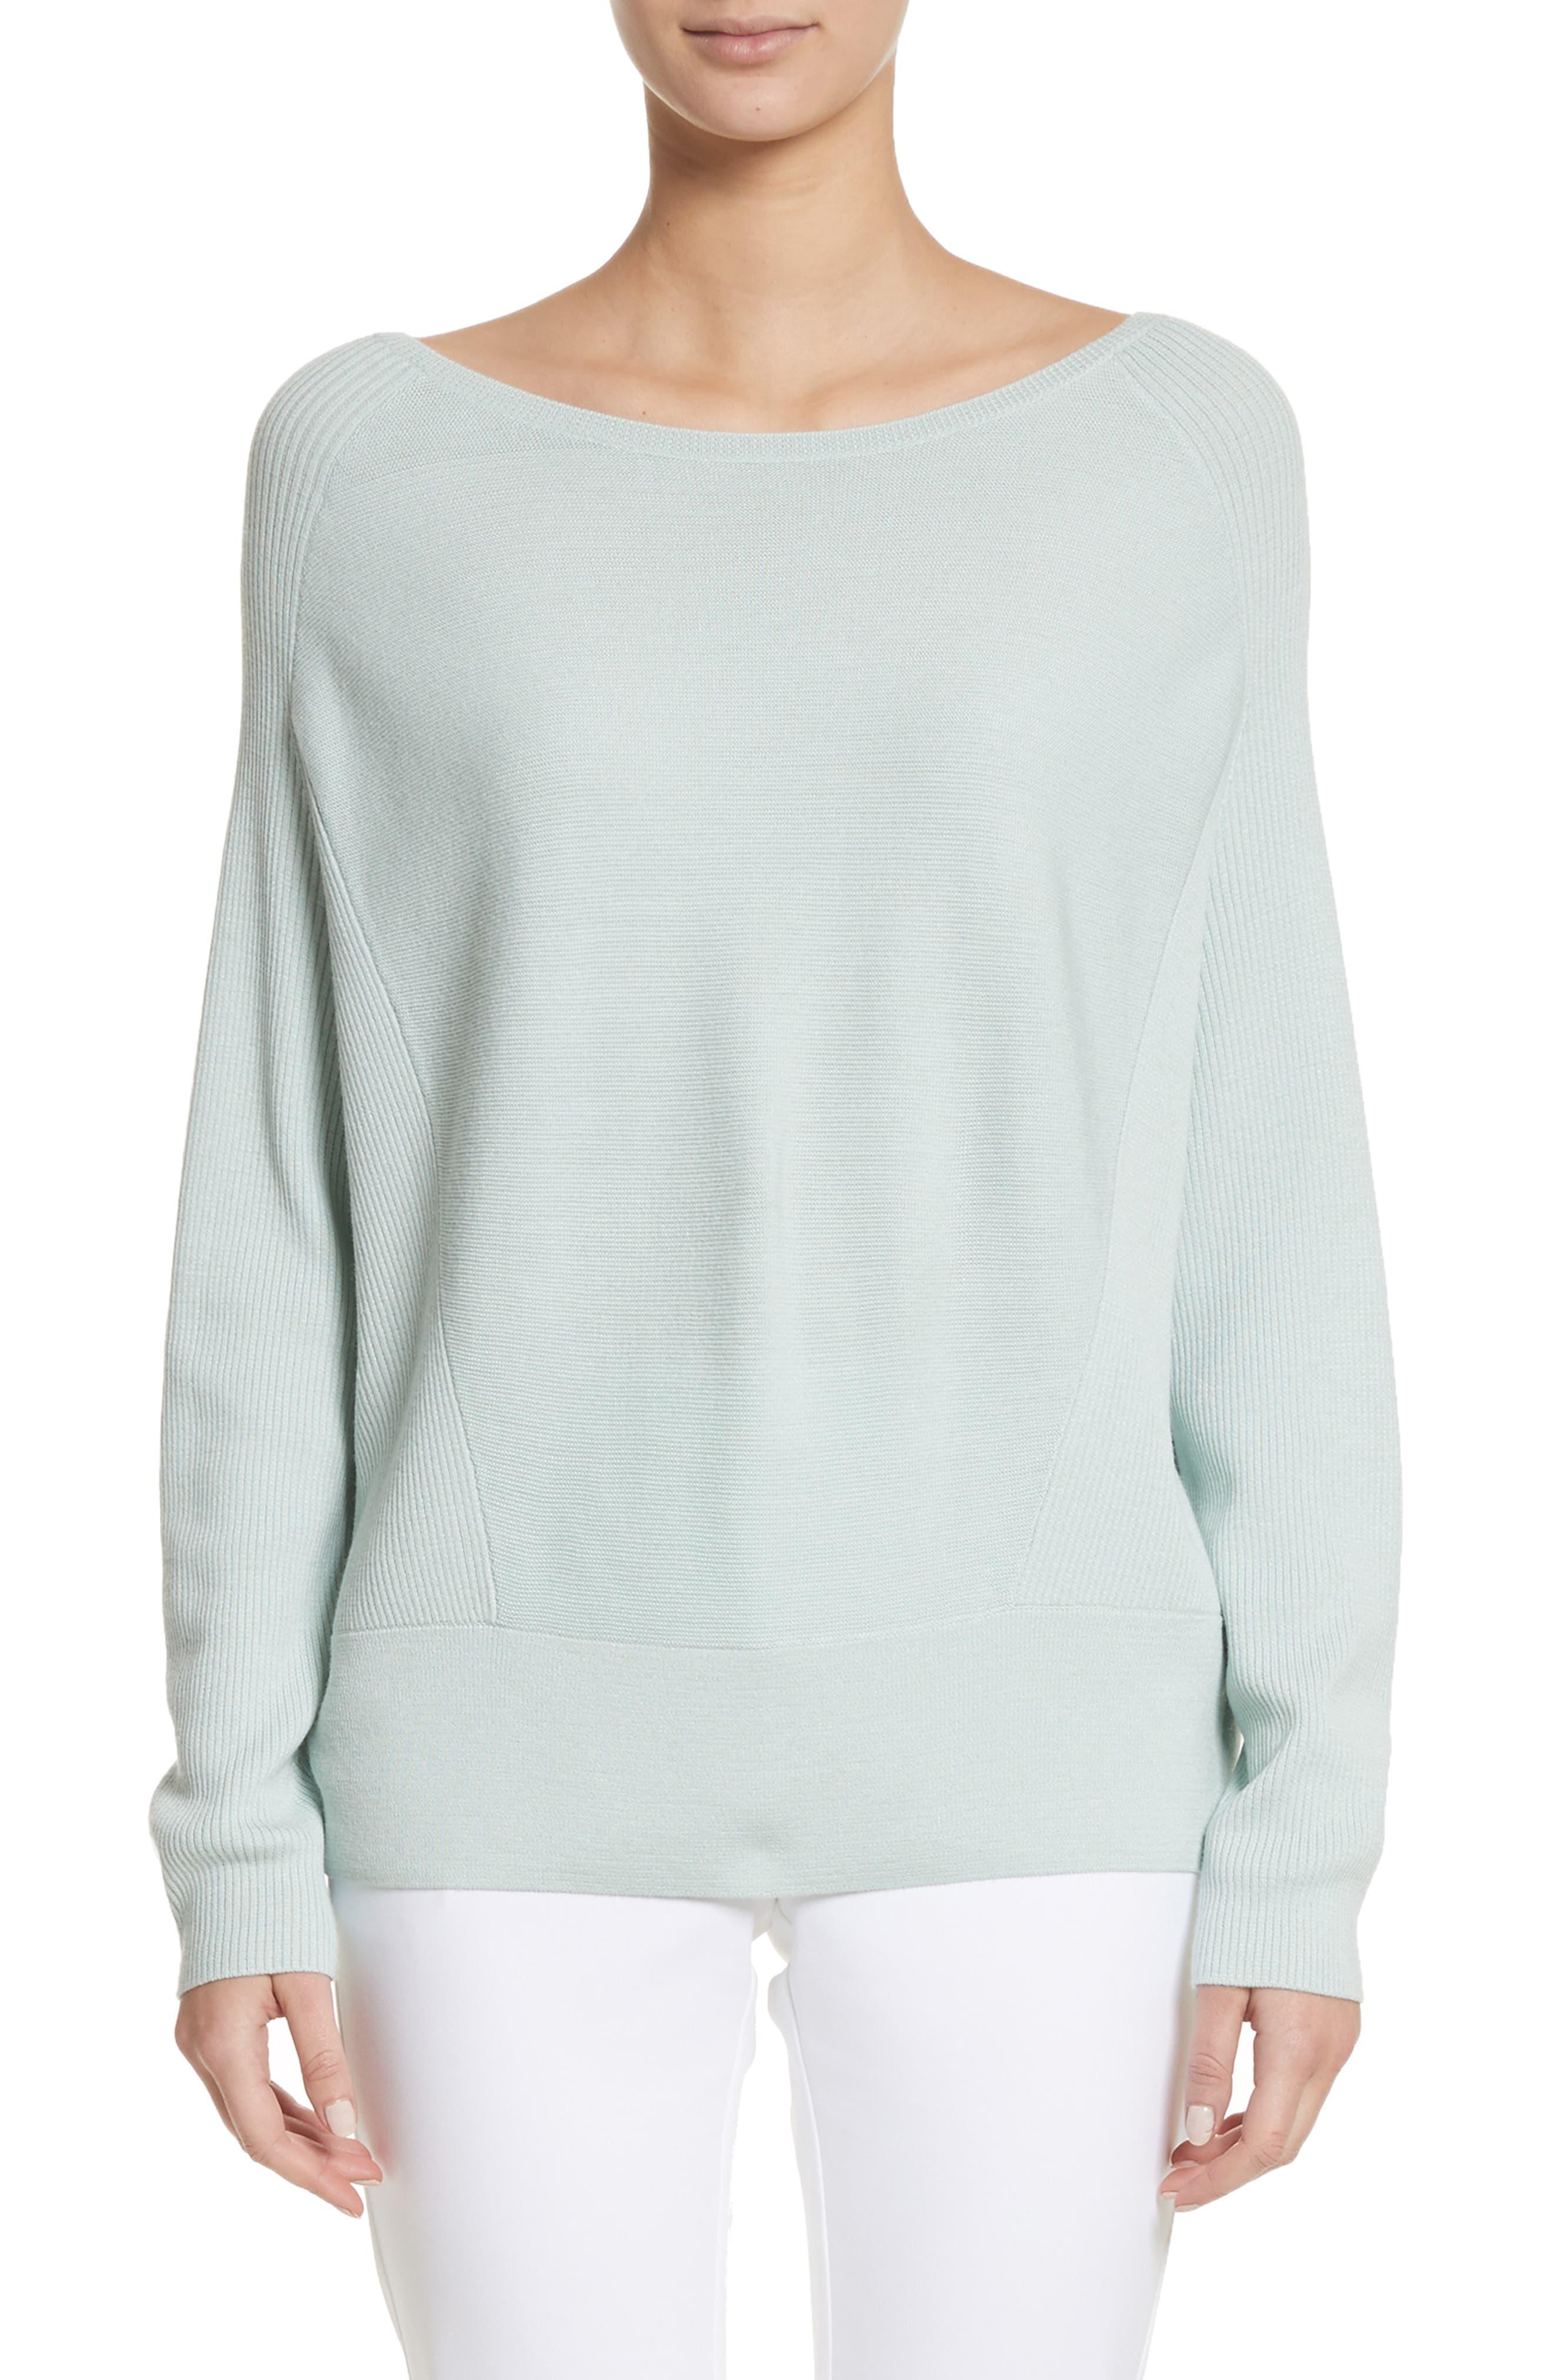 Links Rib Knit Sweater,                         Main,                         color, Mint